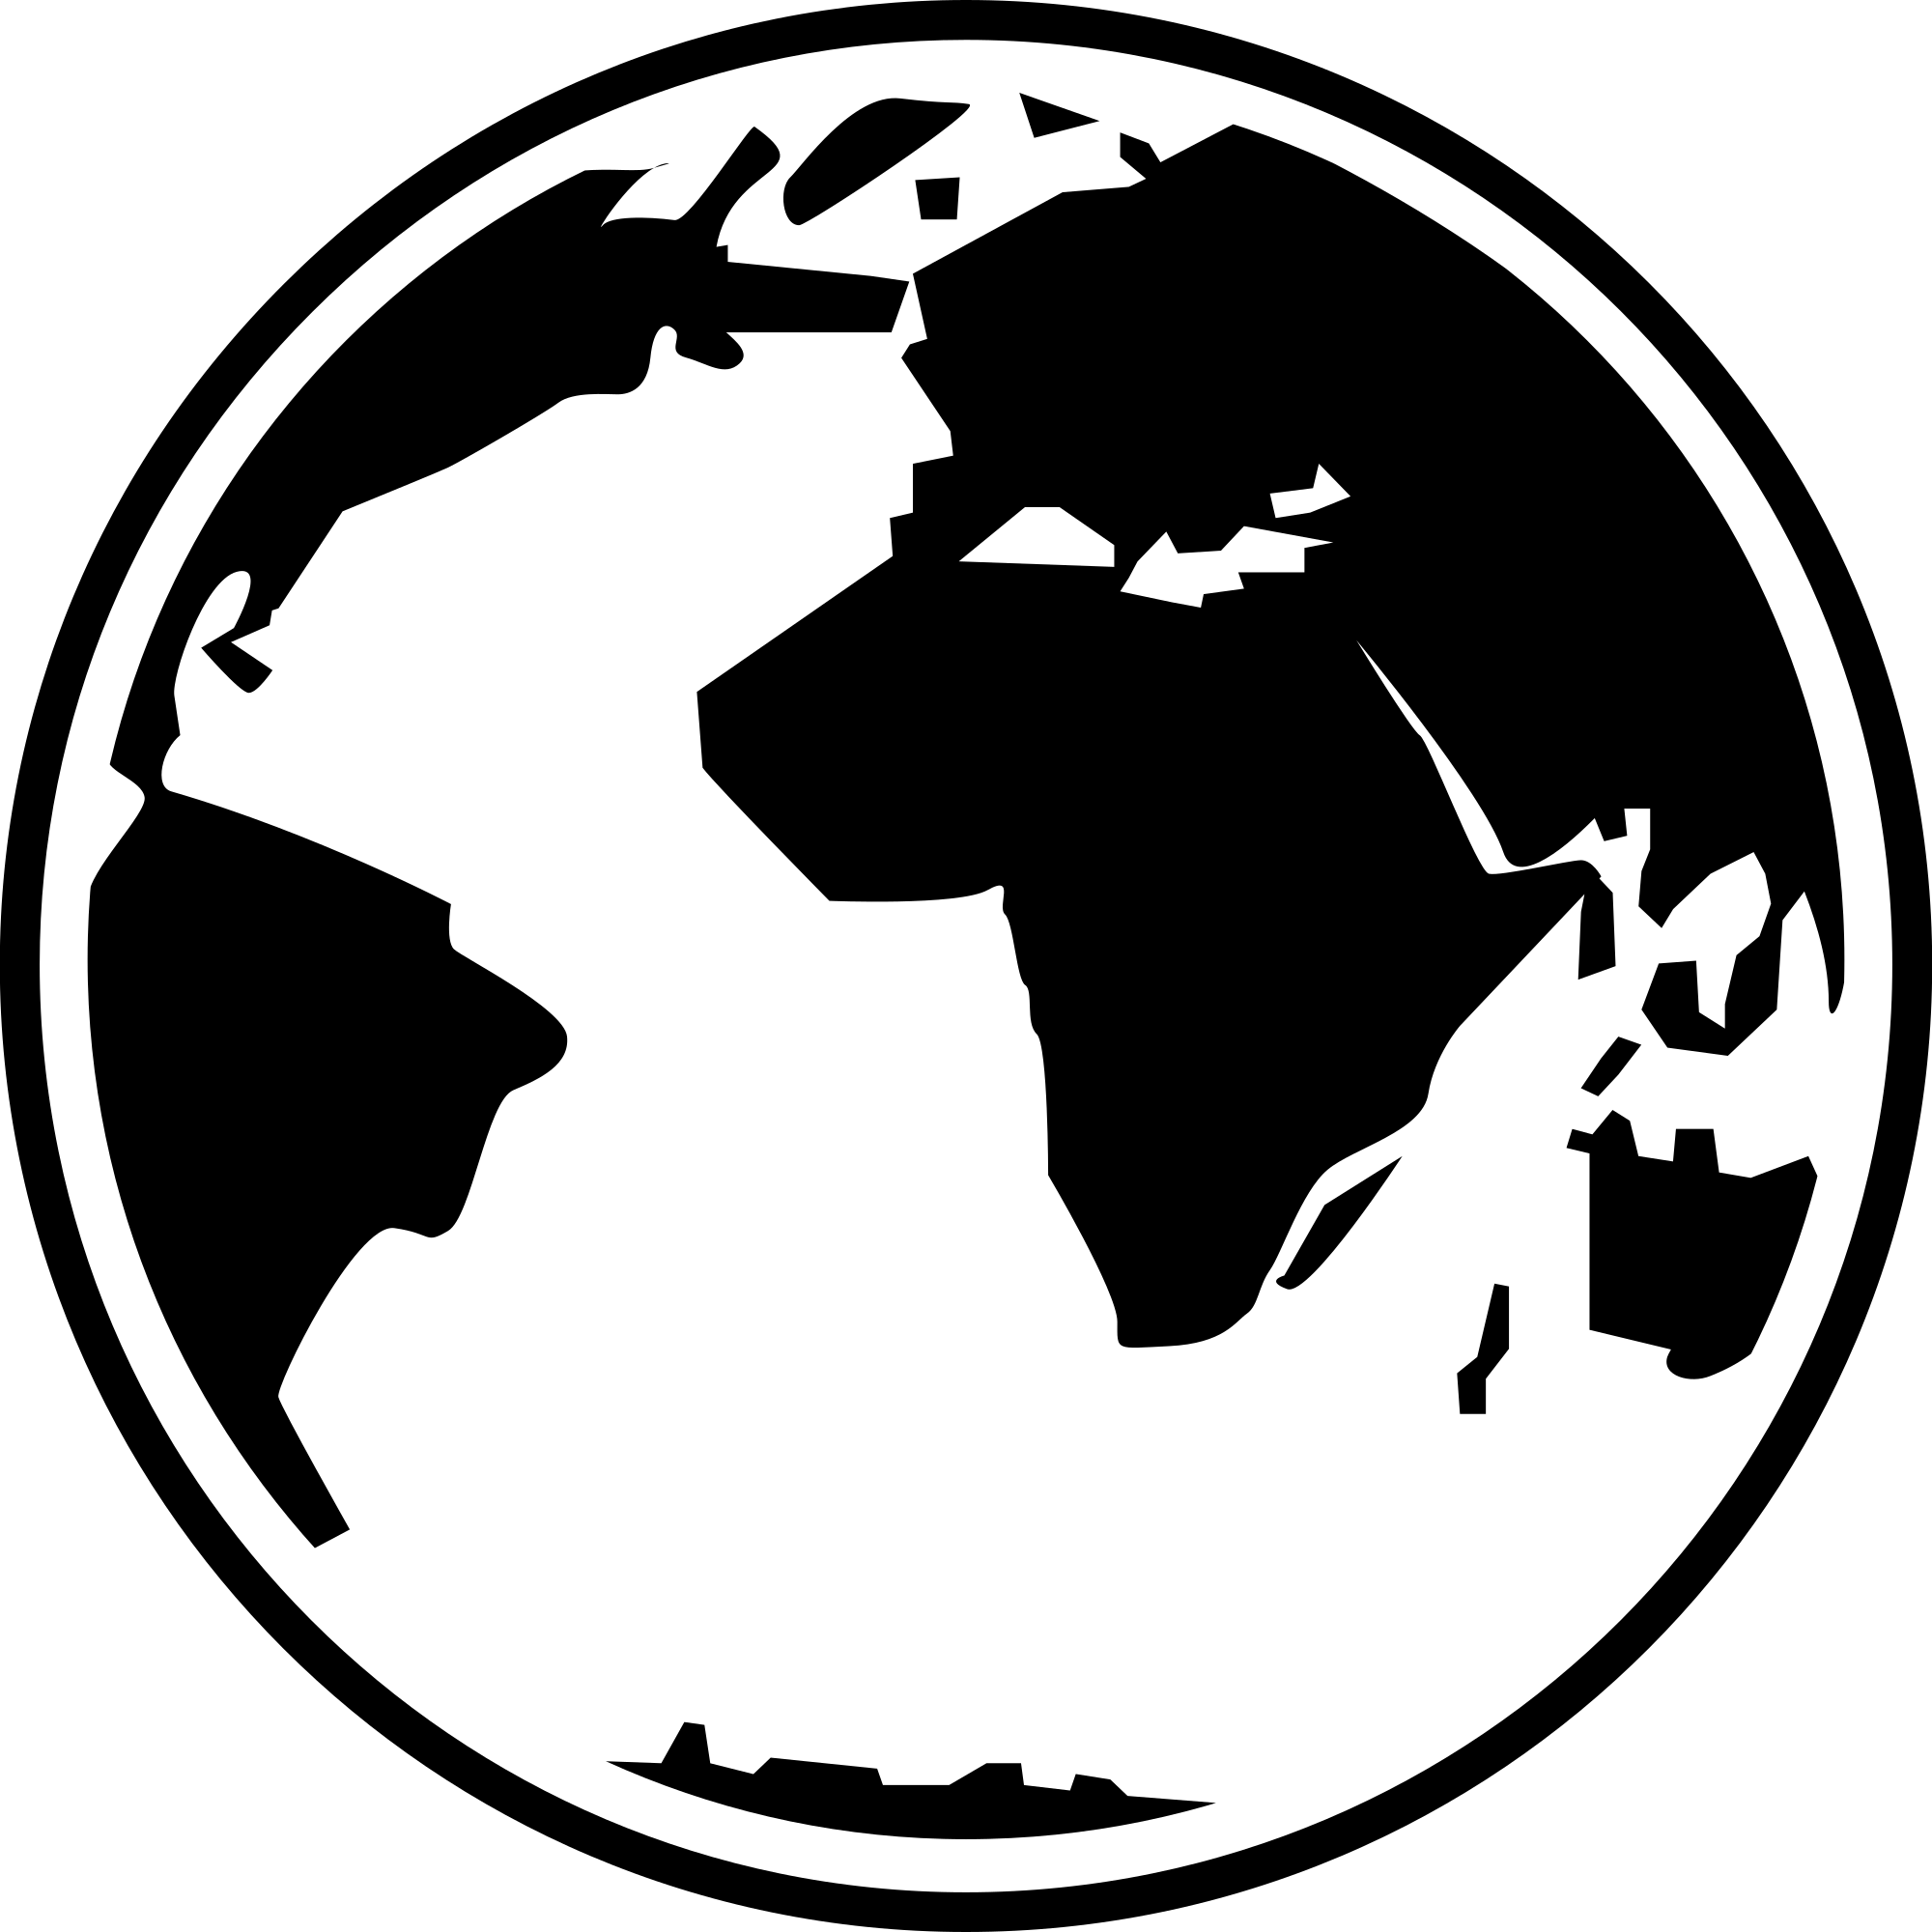 globe clipart symbol